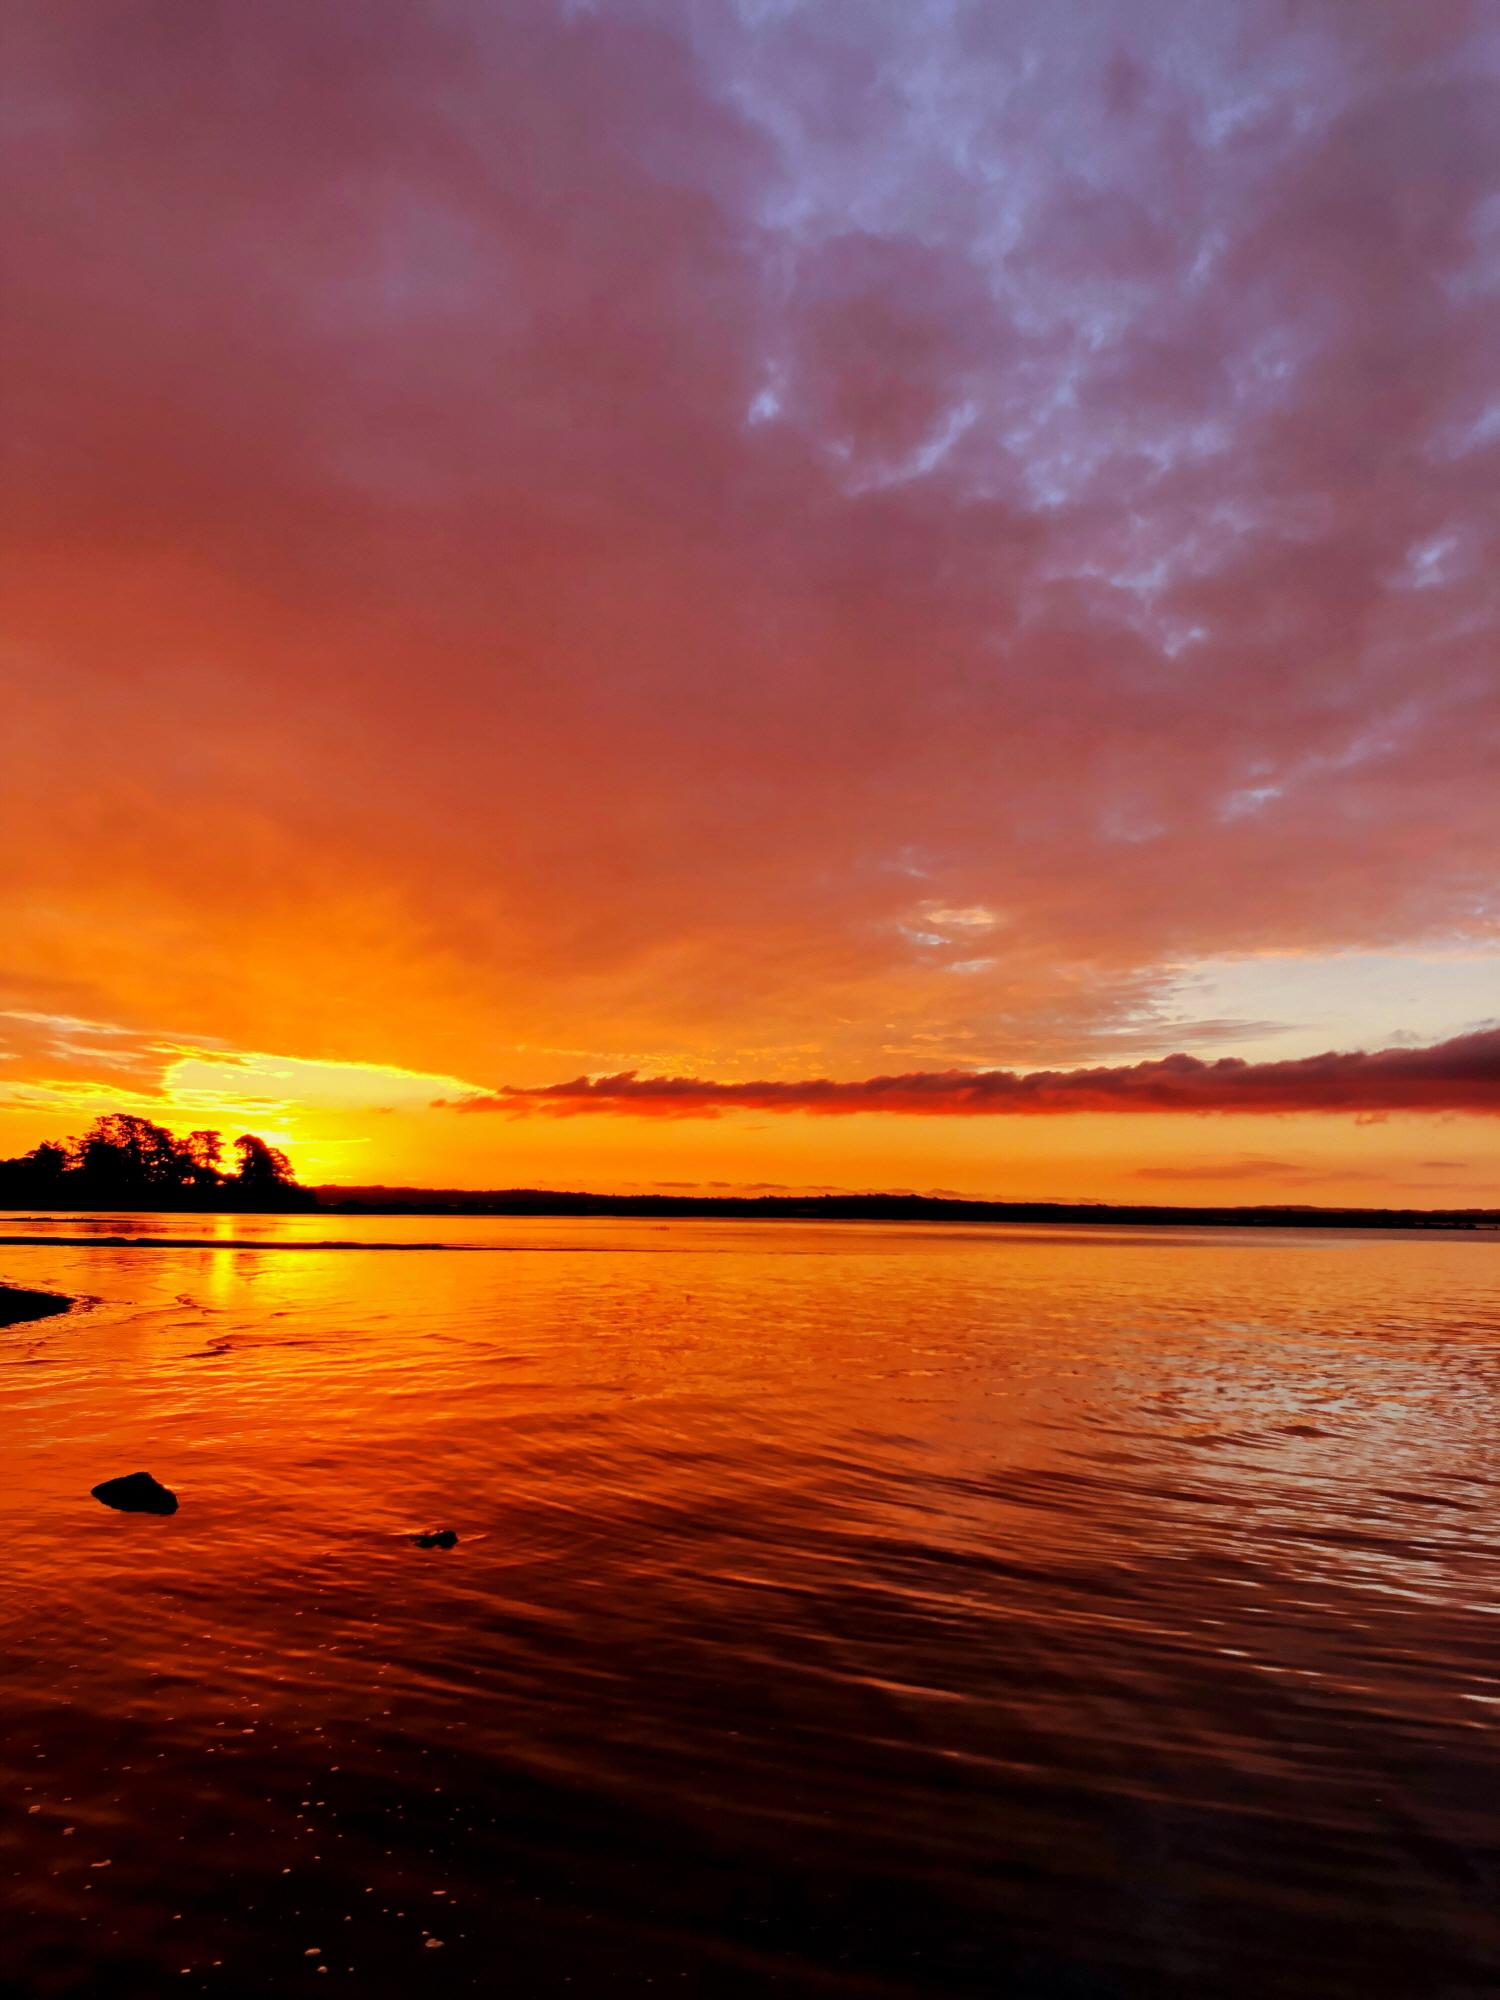 sunset-3673621.jpg